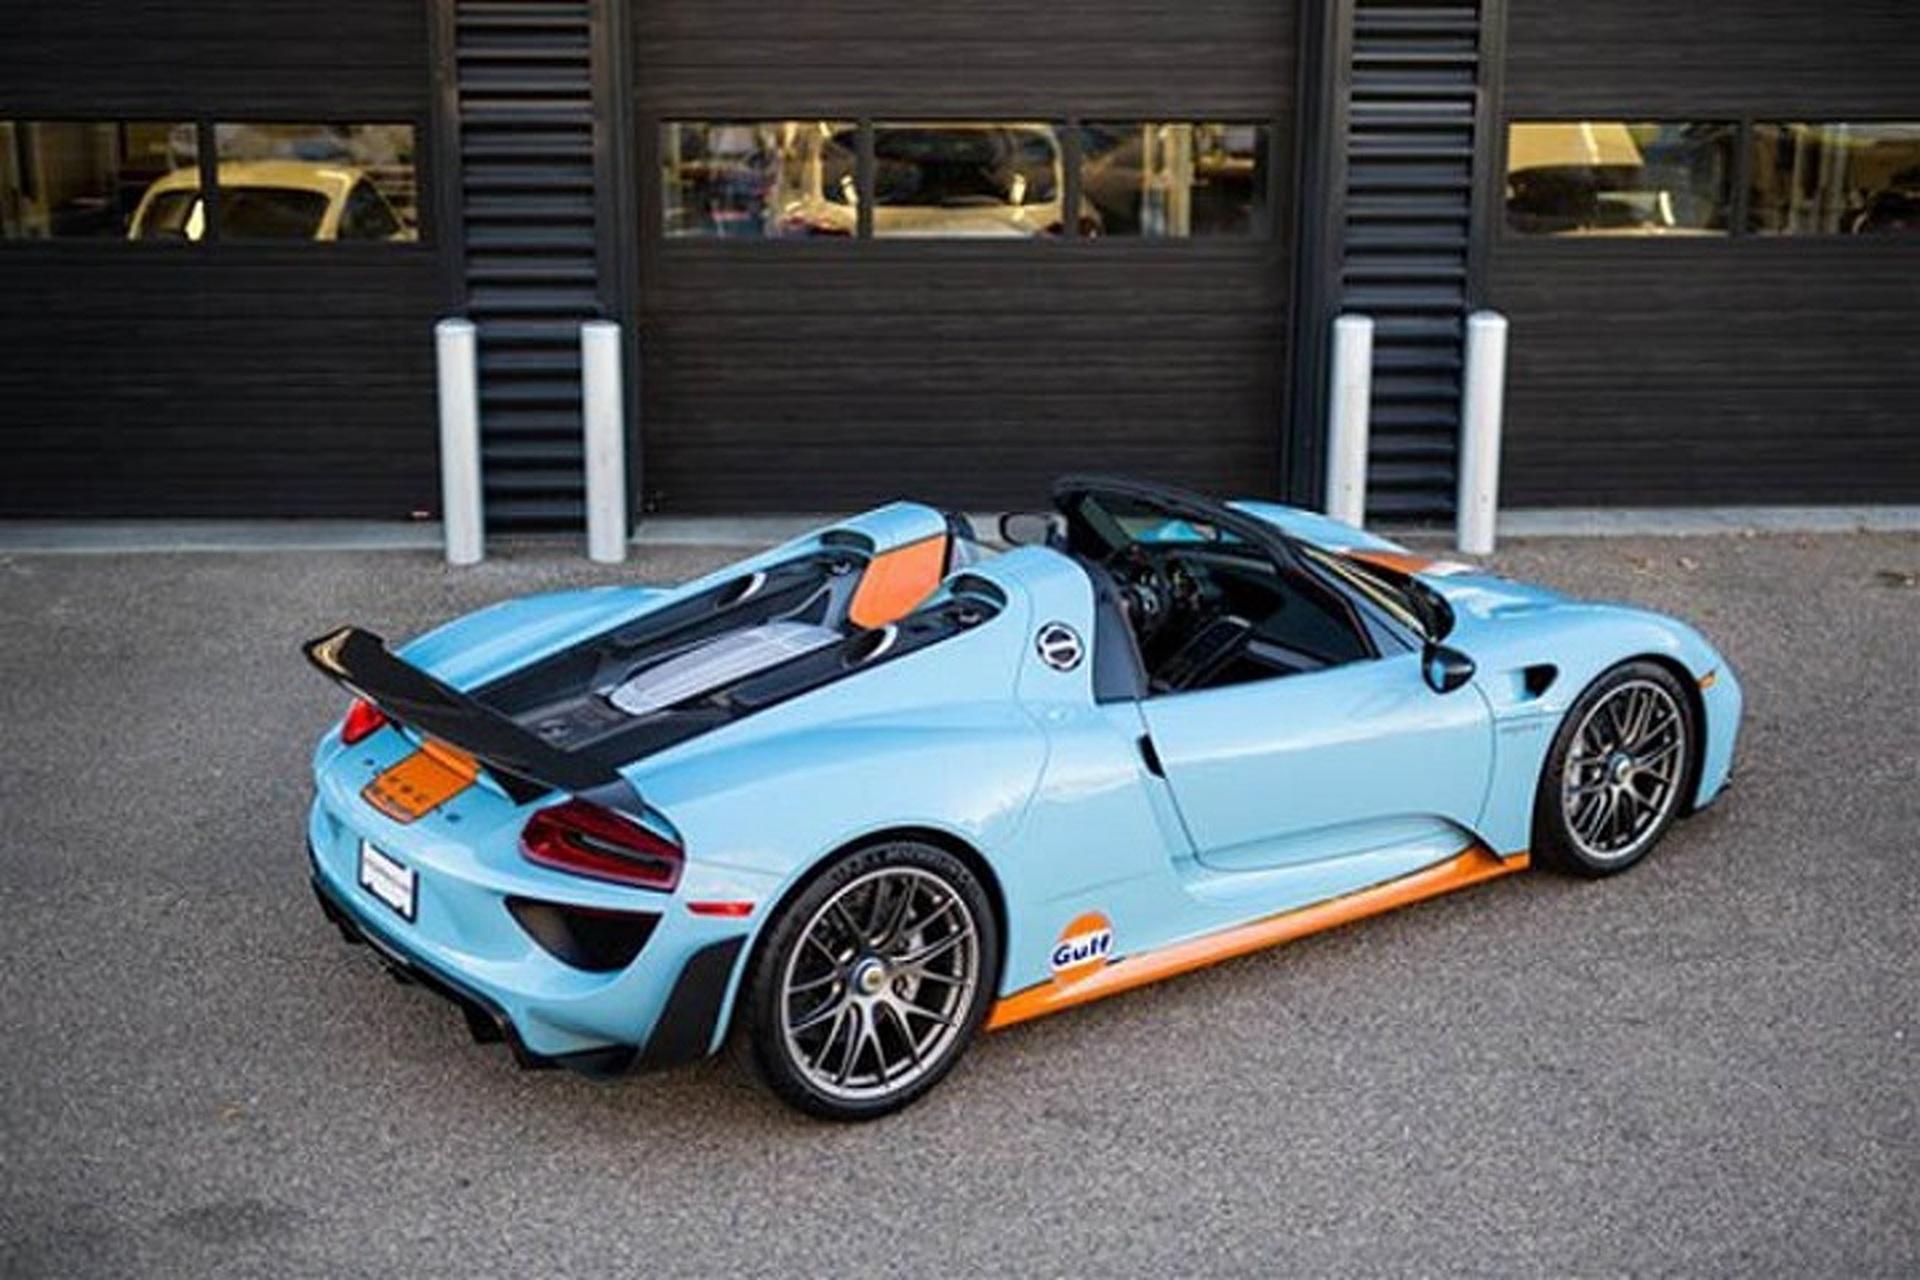 1-of-2 Gulf Liveried Porsche 918 Spyder Up For Sale